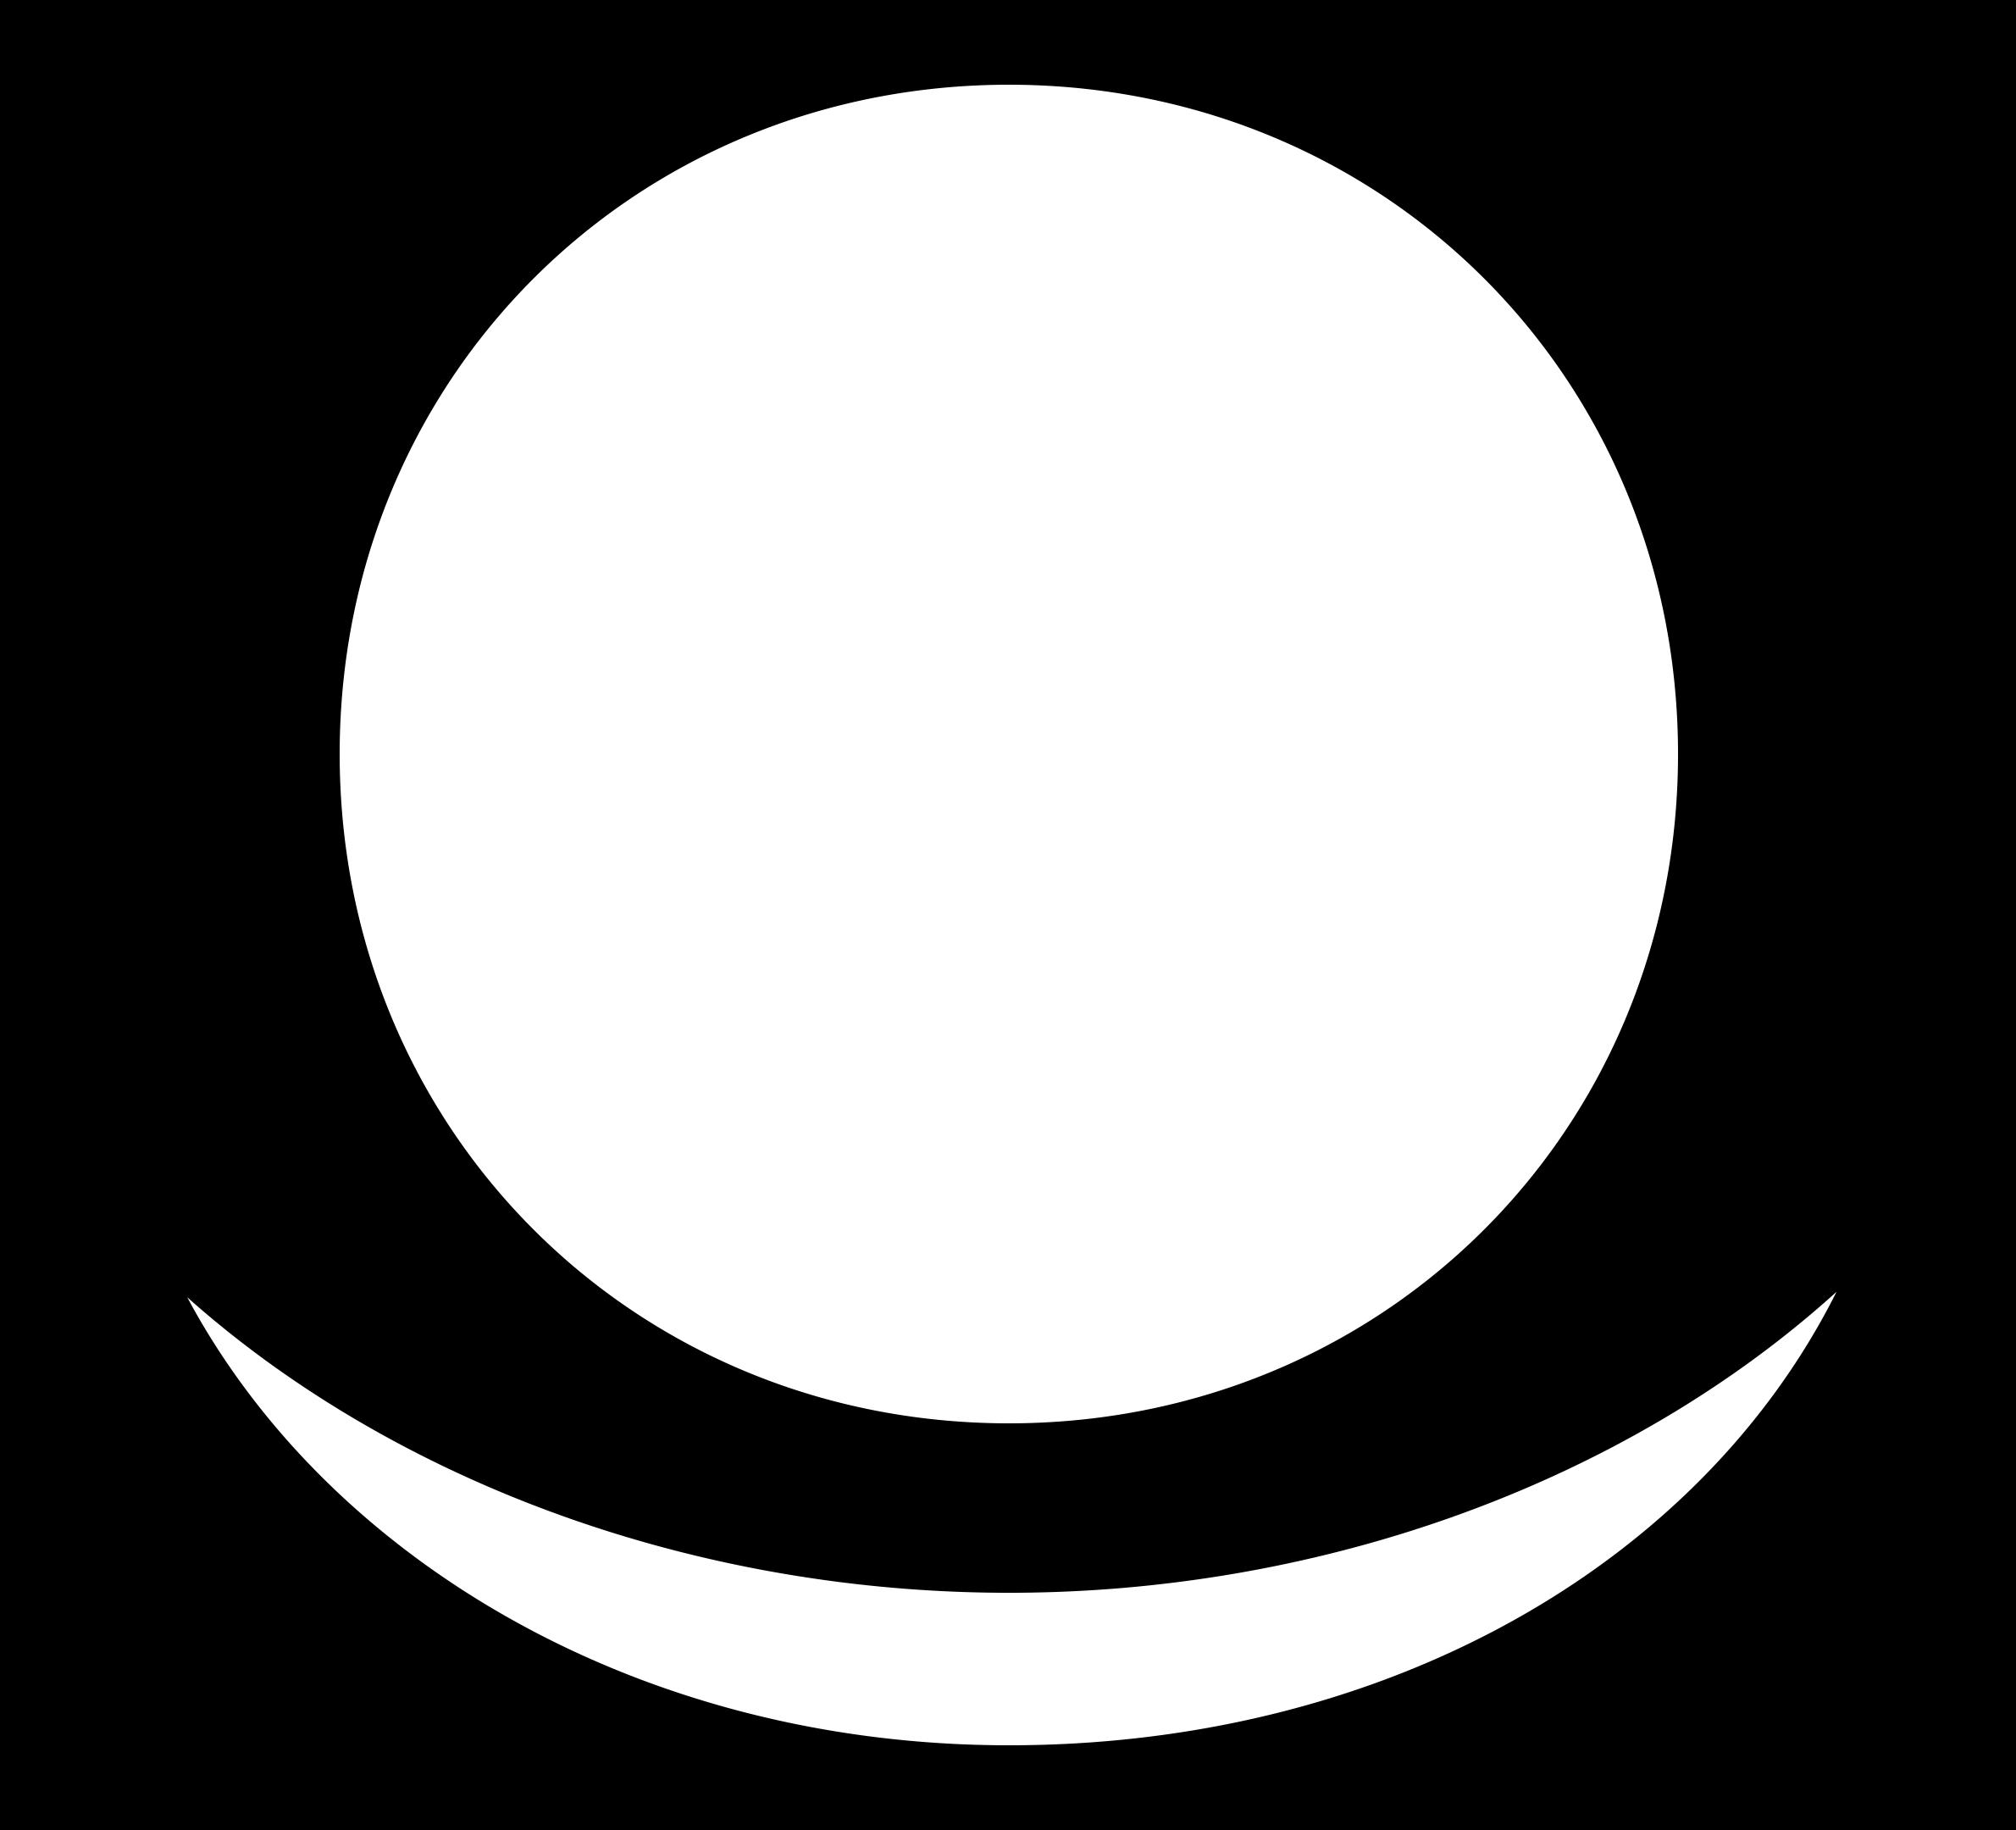 Clipart Ancient Sacred Symbol